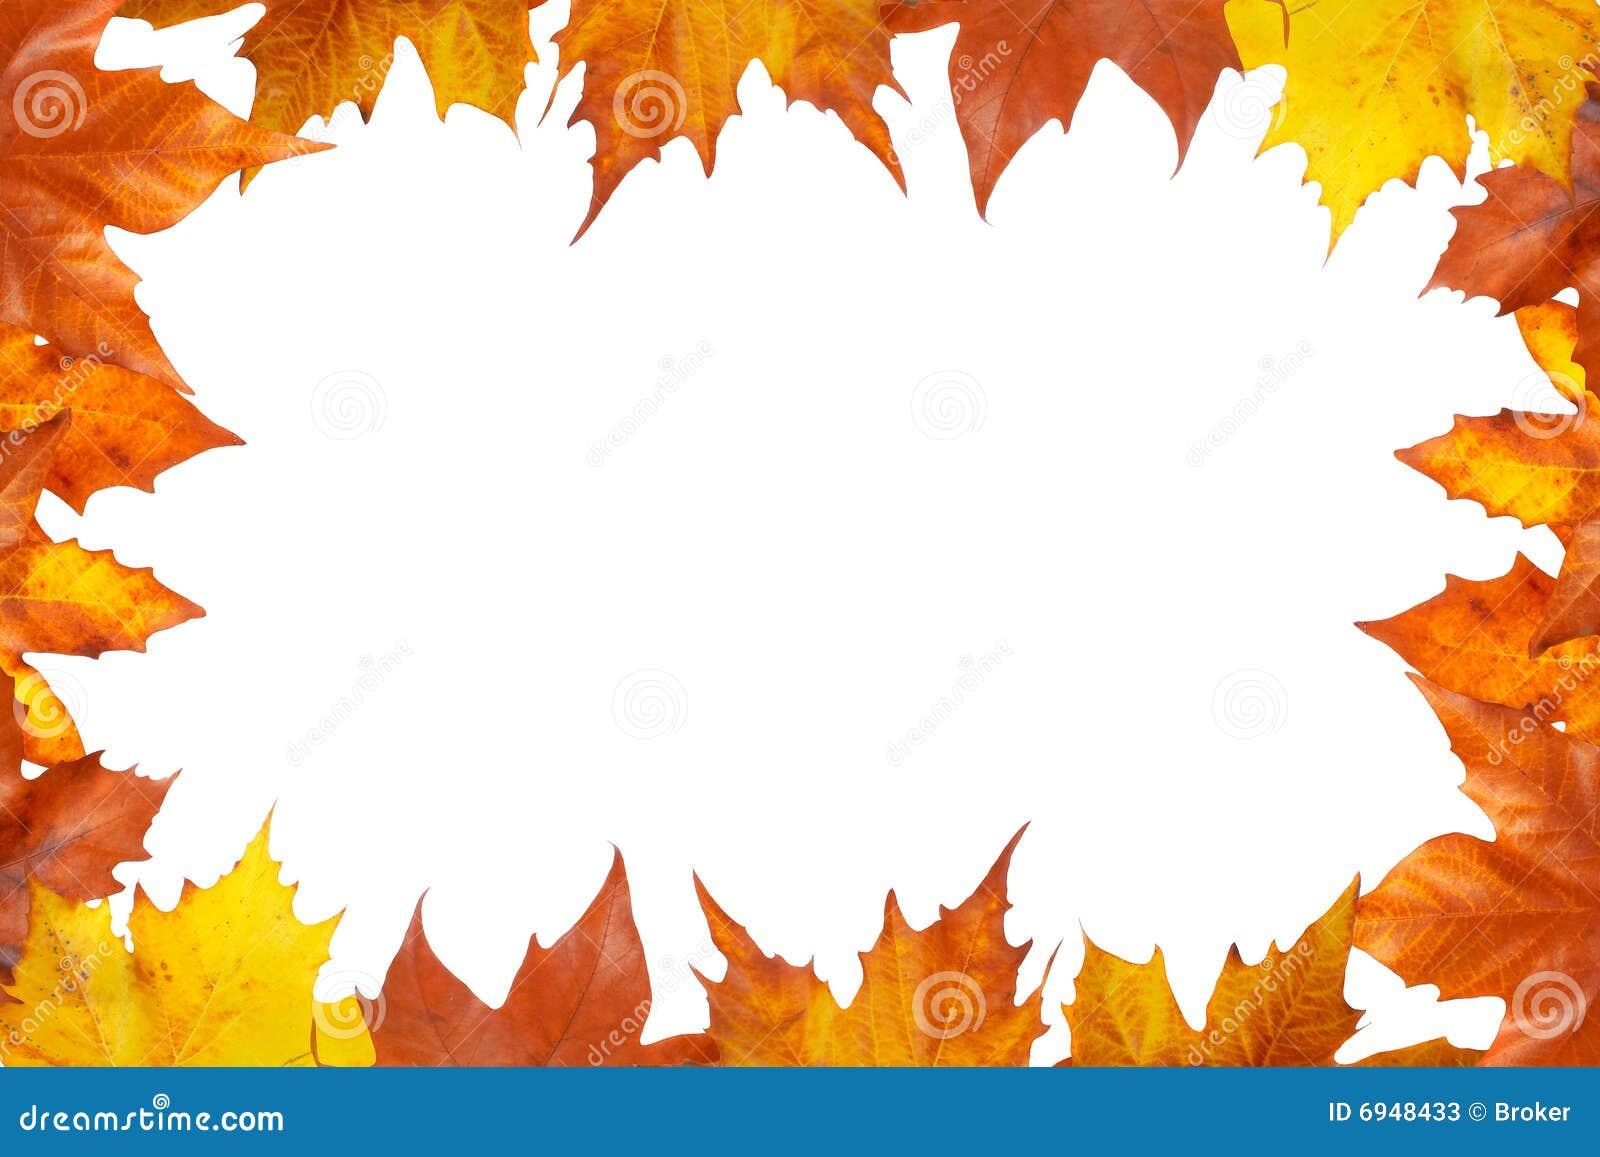 herbstrand stockfotos bild 6948433 congratulations clipart free congratulations clipart images